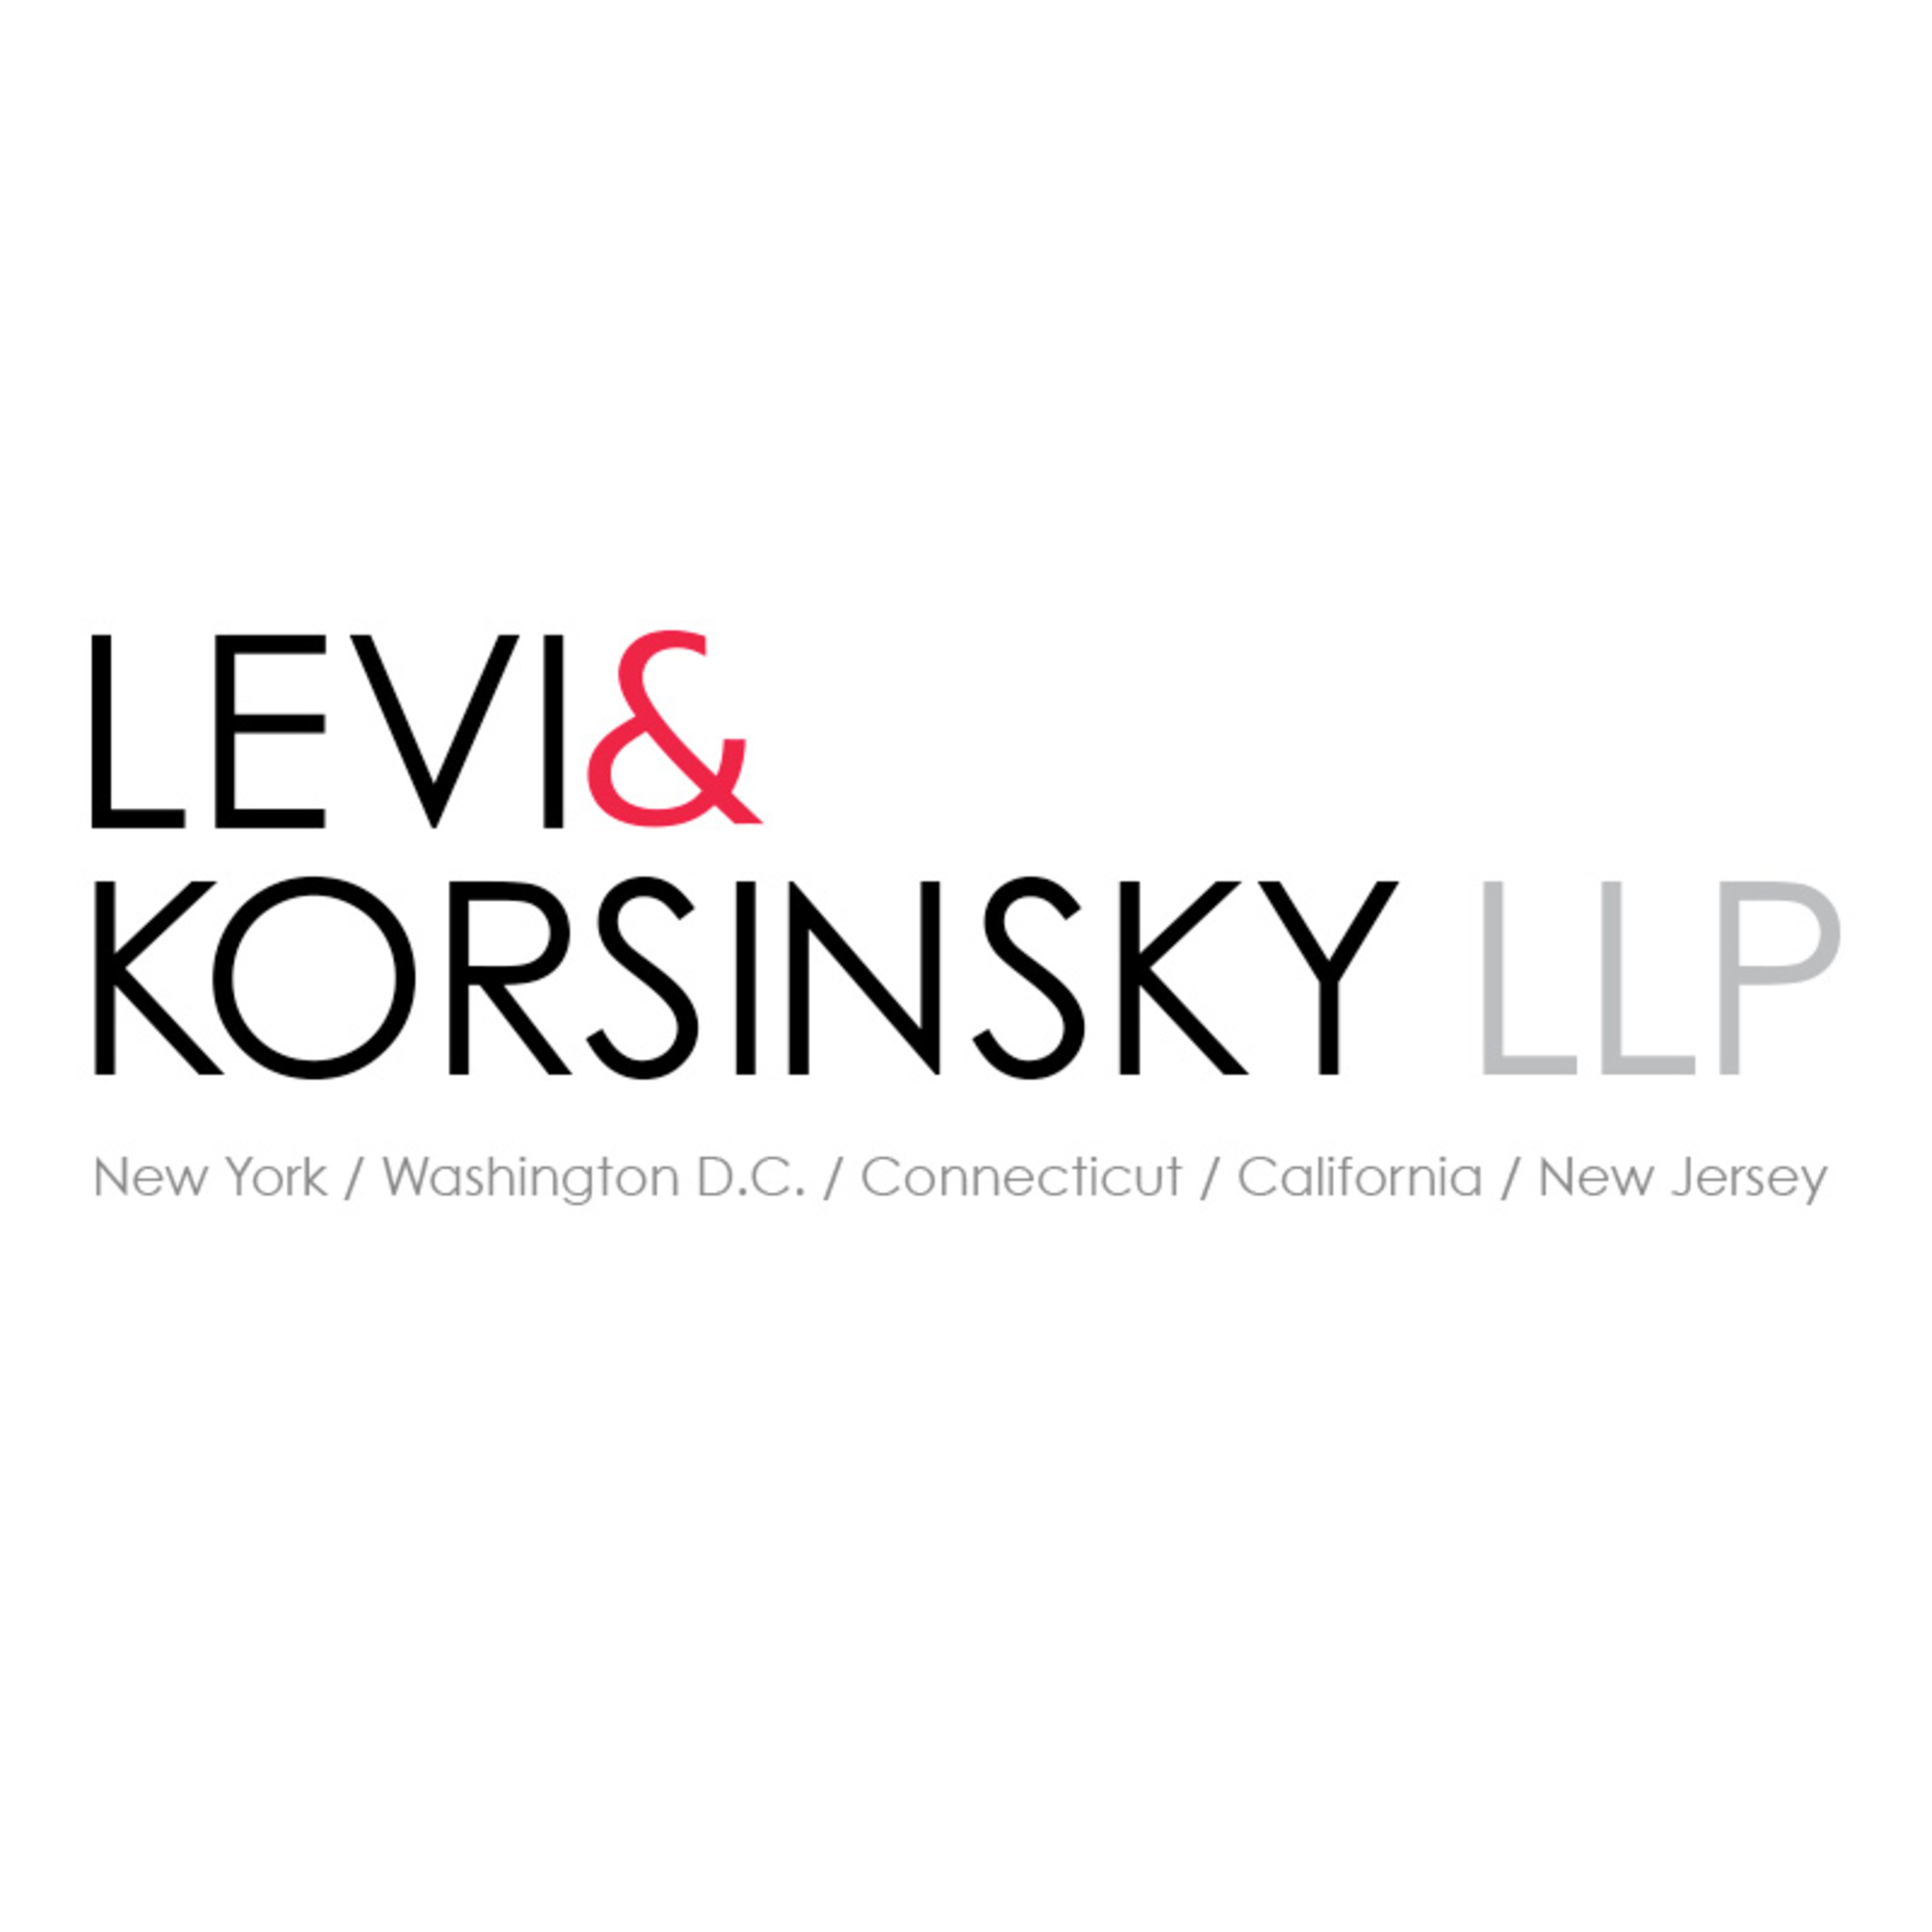 Protecting the Rights of Shareholders. (PRNewsFoto/Levi & Korsinsky, LLP)